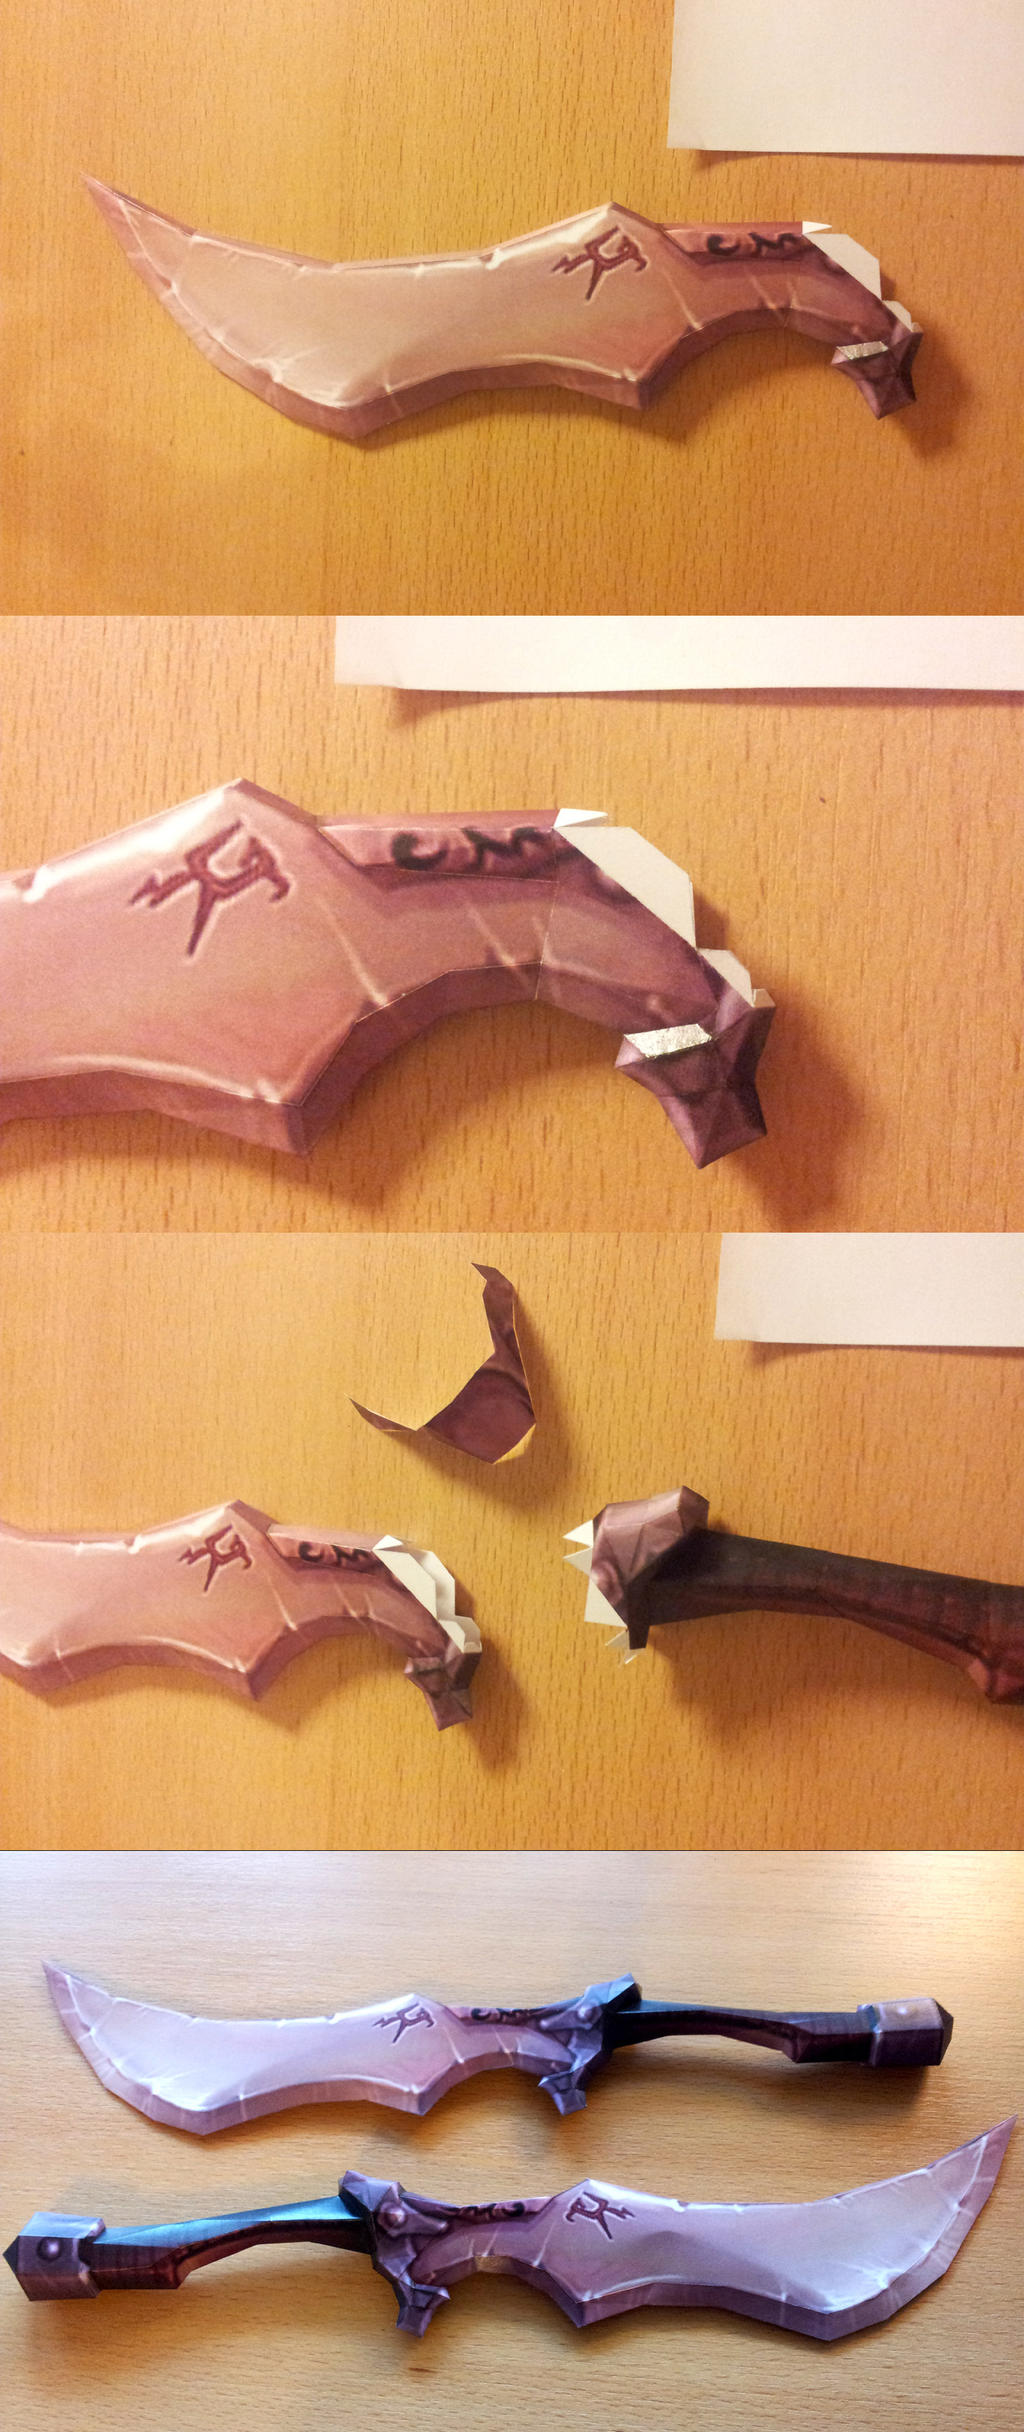 Avian Defender  - dagger